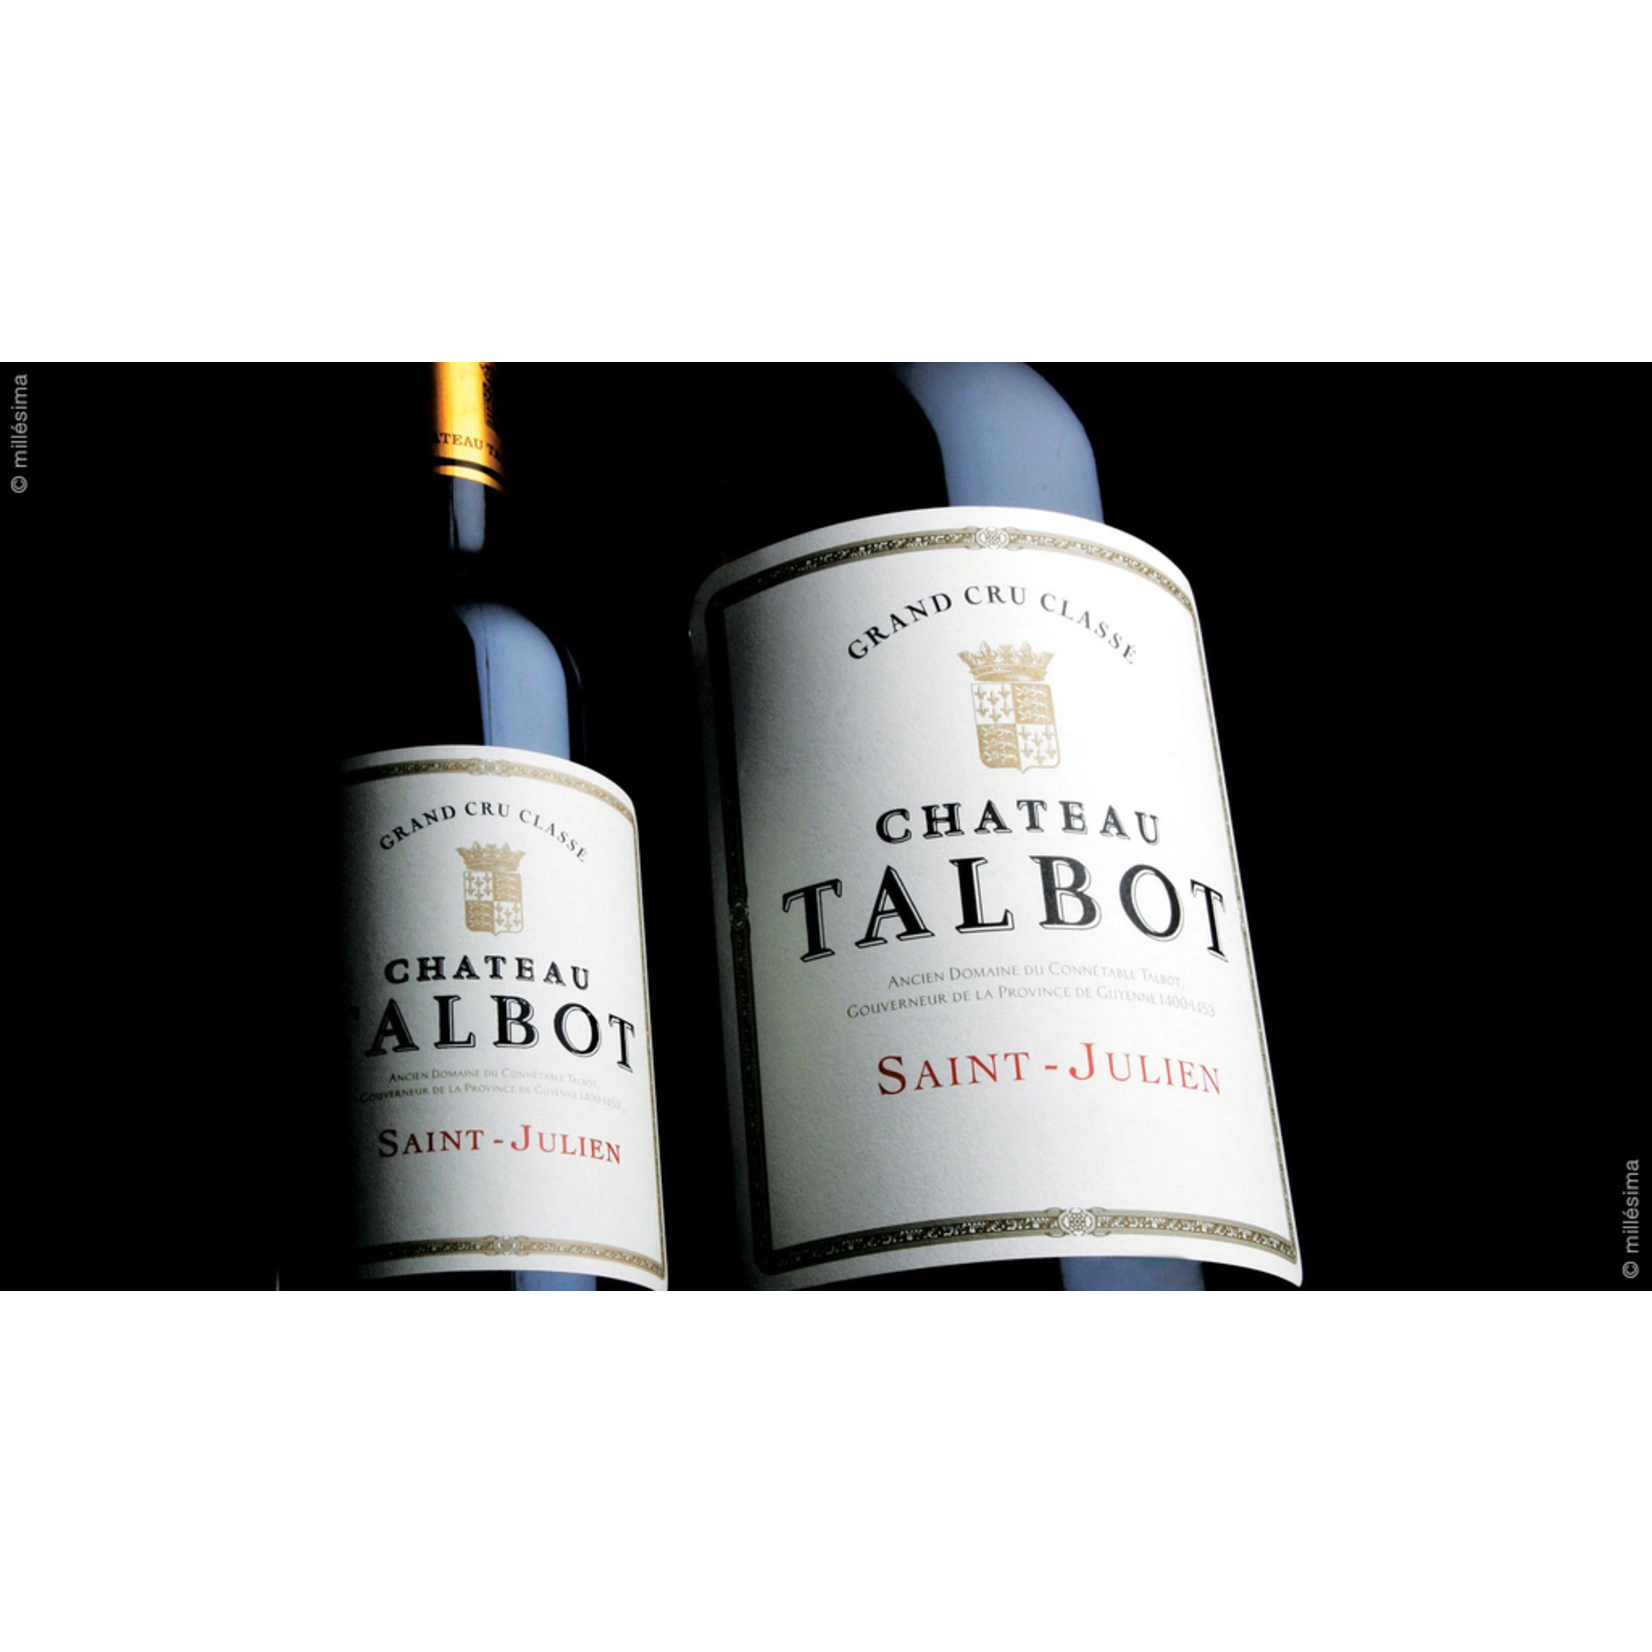 Wine Chateau Talbot 2011